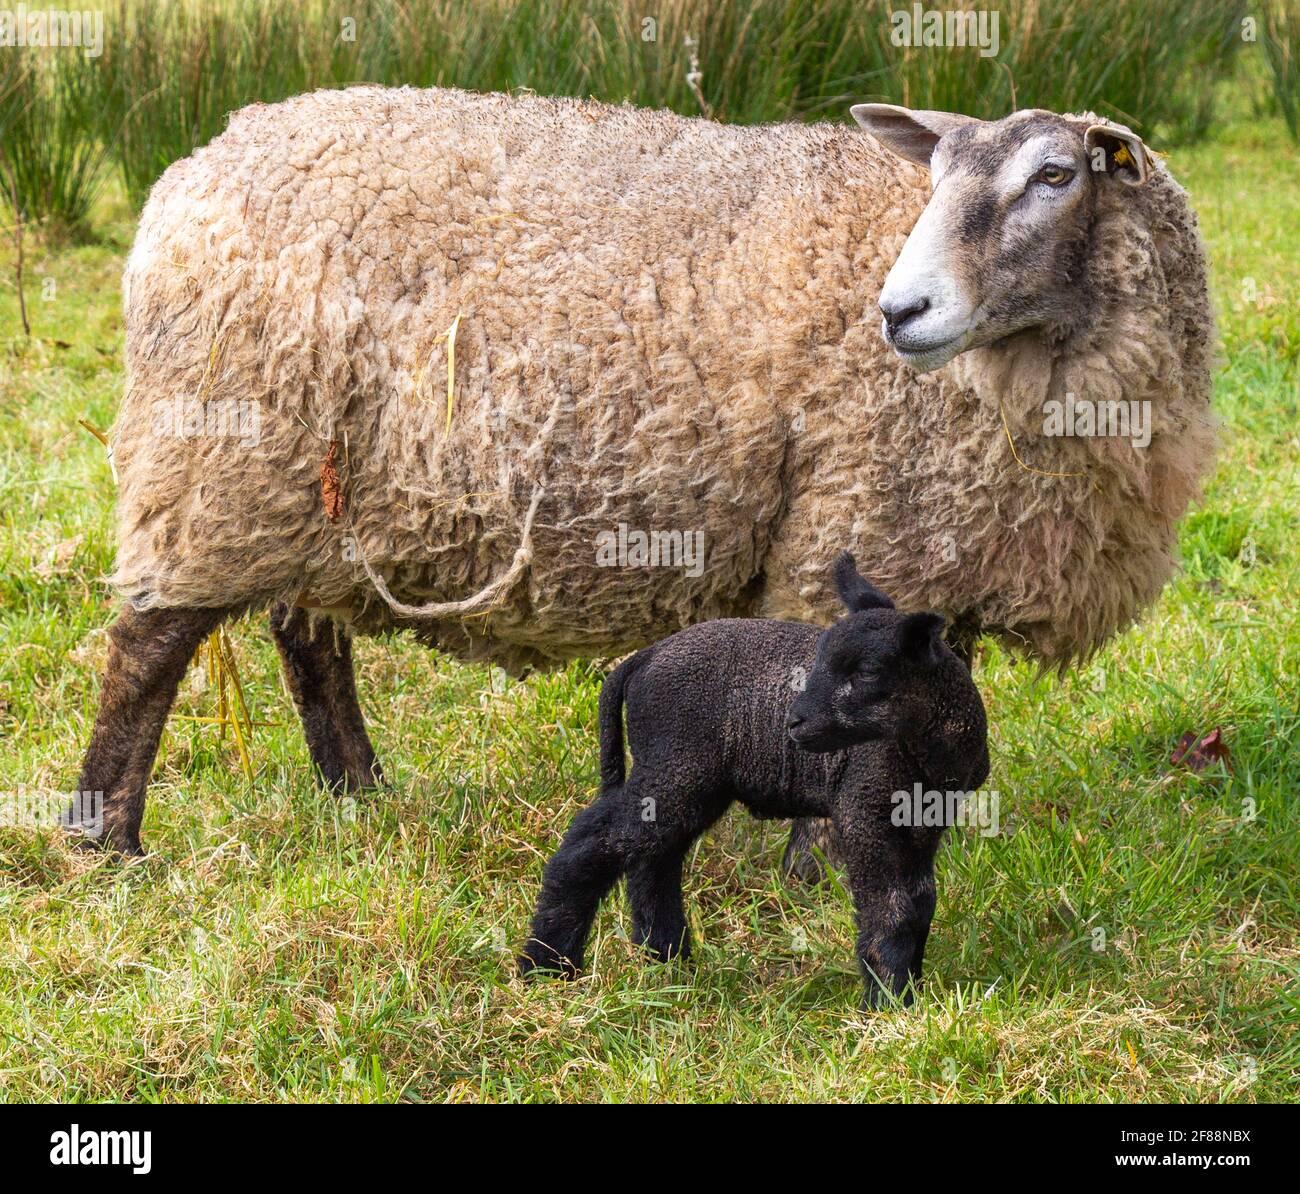 Suffolk Cross Ewe Ovis aries con corderos negros de un día Foto de stock